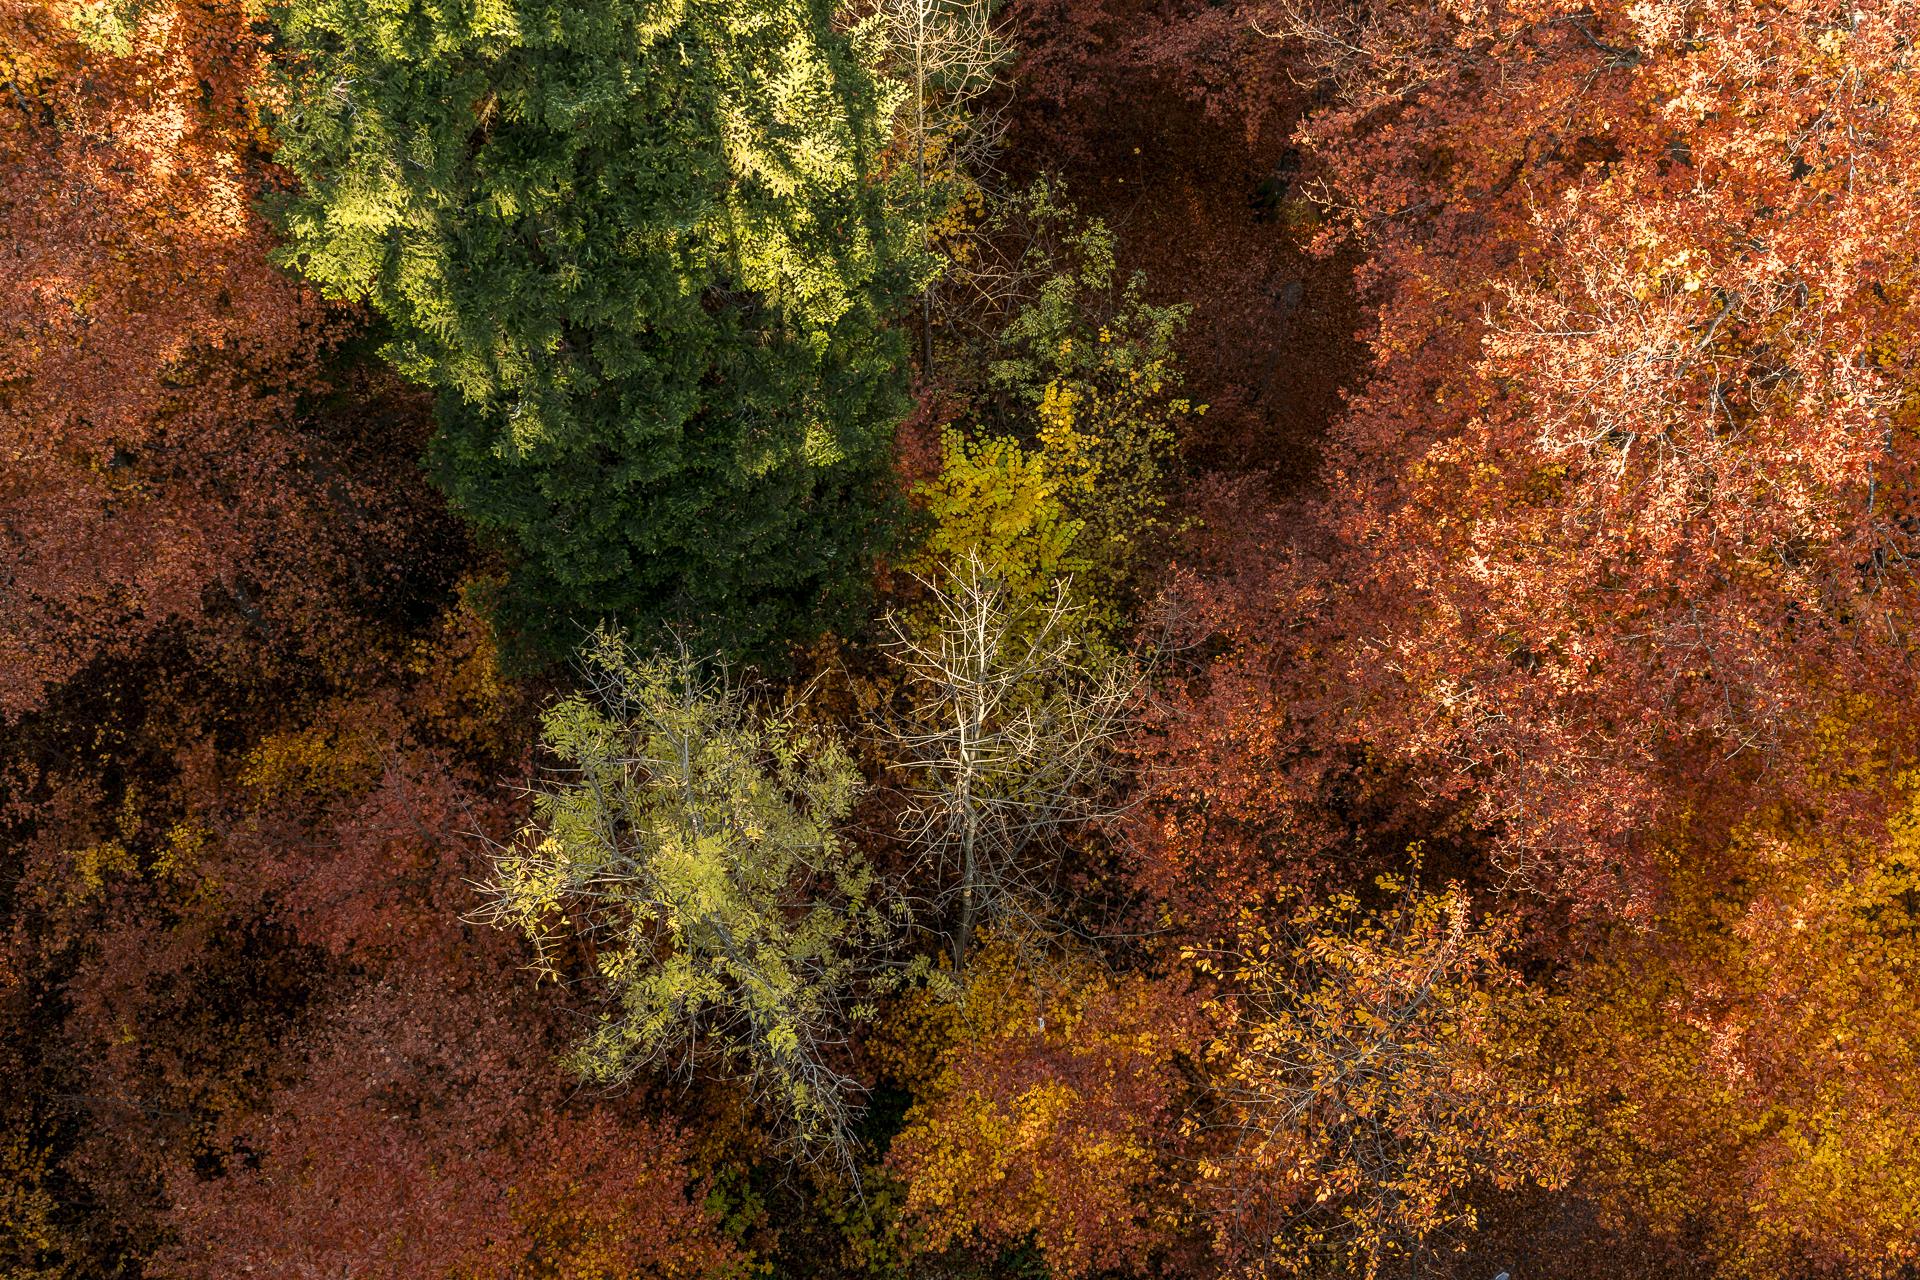 Adlisberg Herbstwald